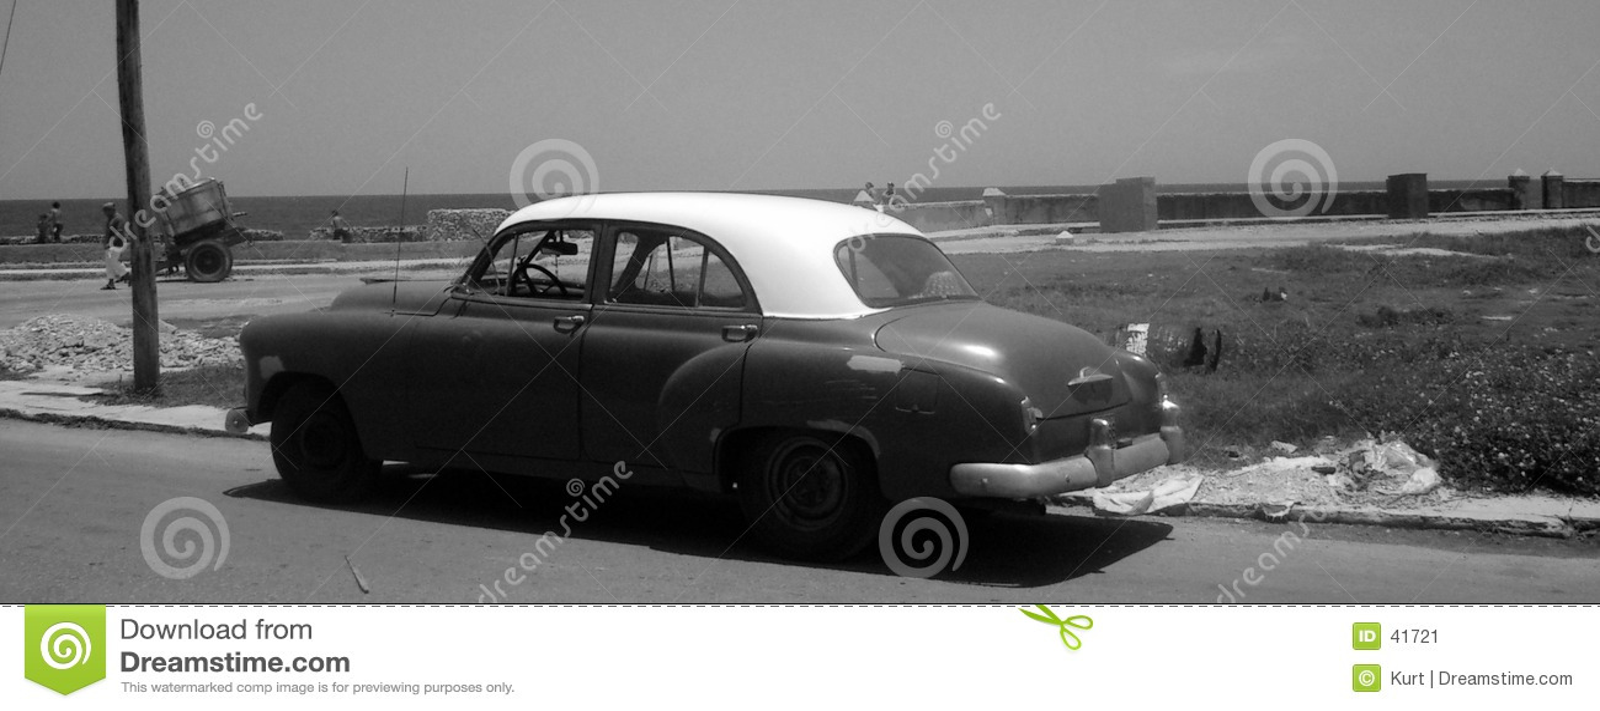 American car fifties